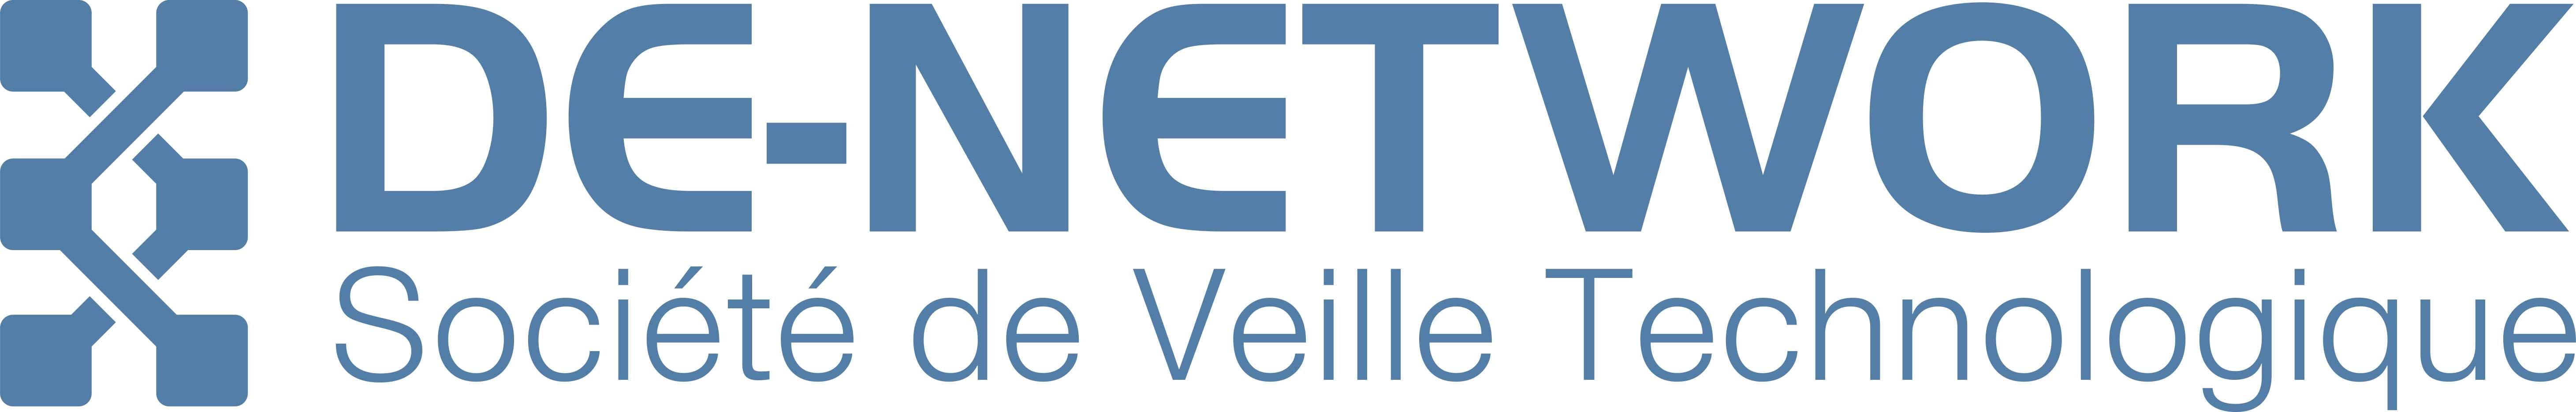 Logotype DE-NETWORK